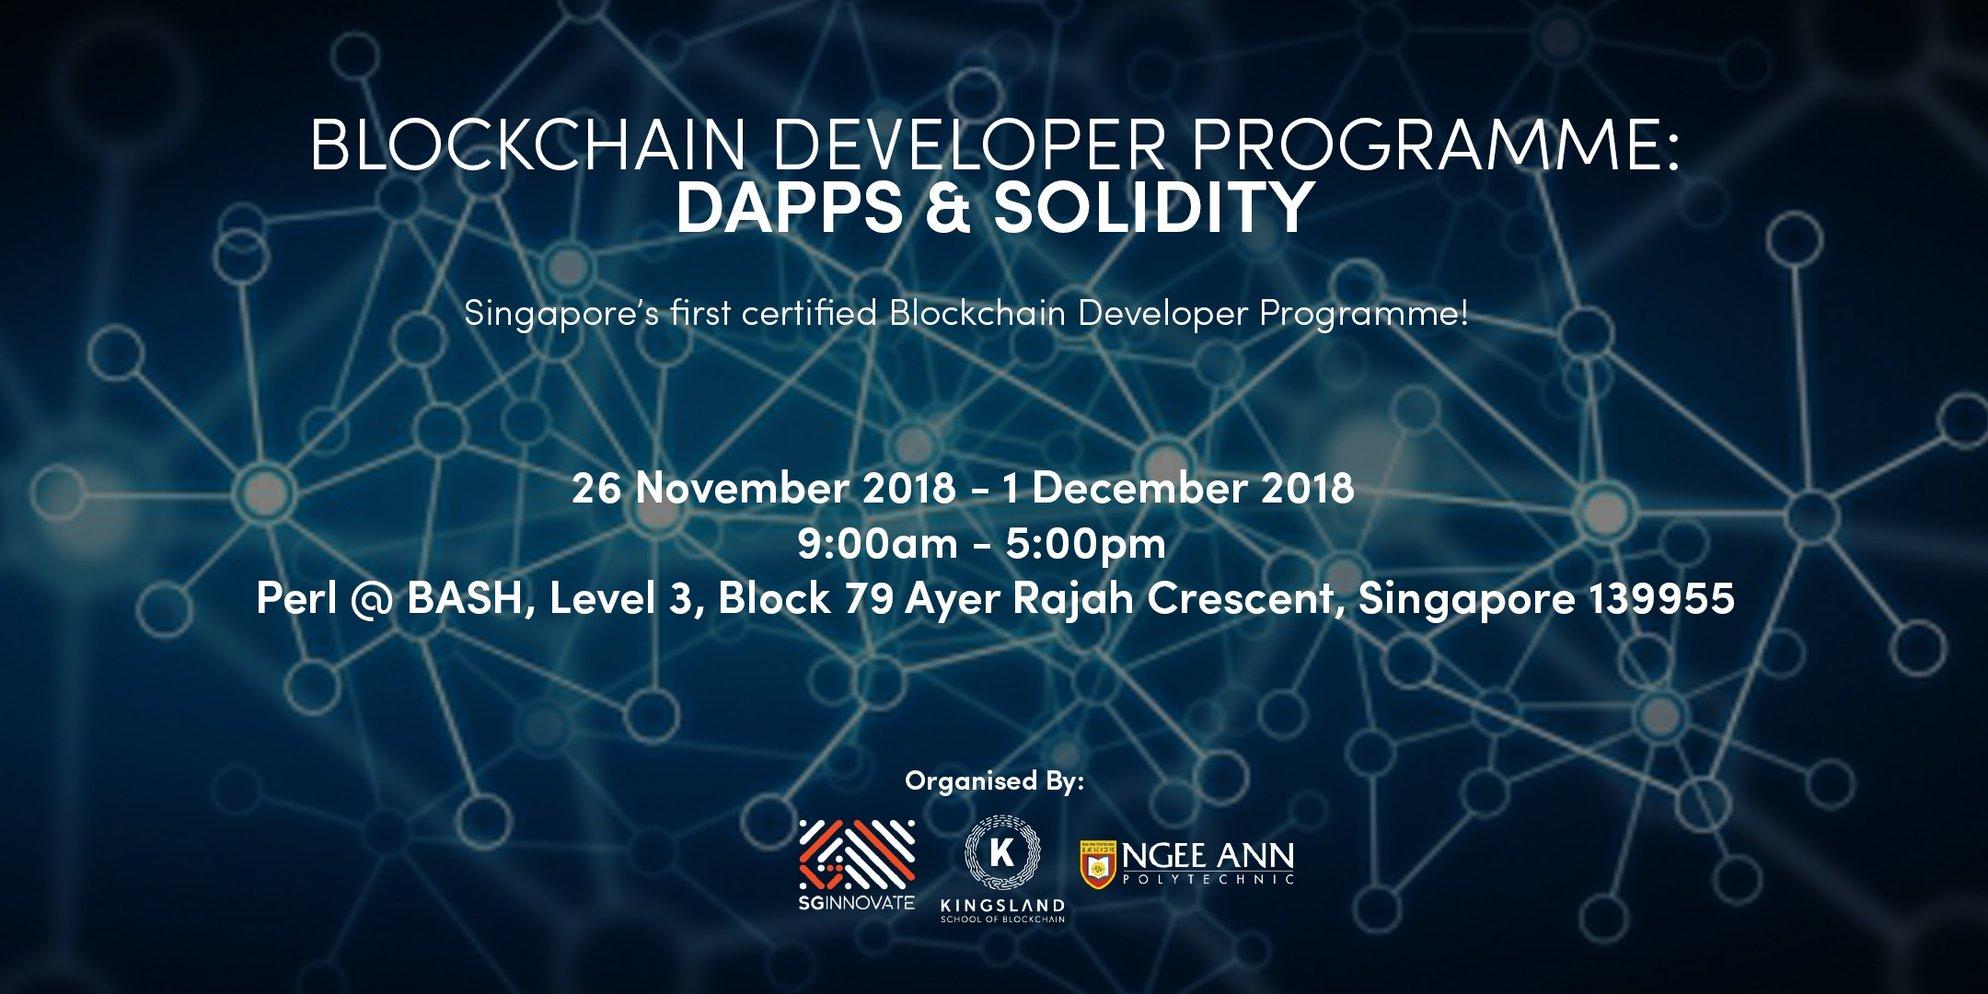 blockchain-developer-wrokshop-blockchain-networks